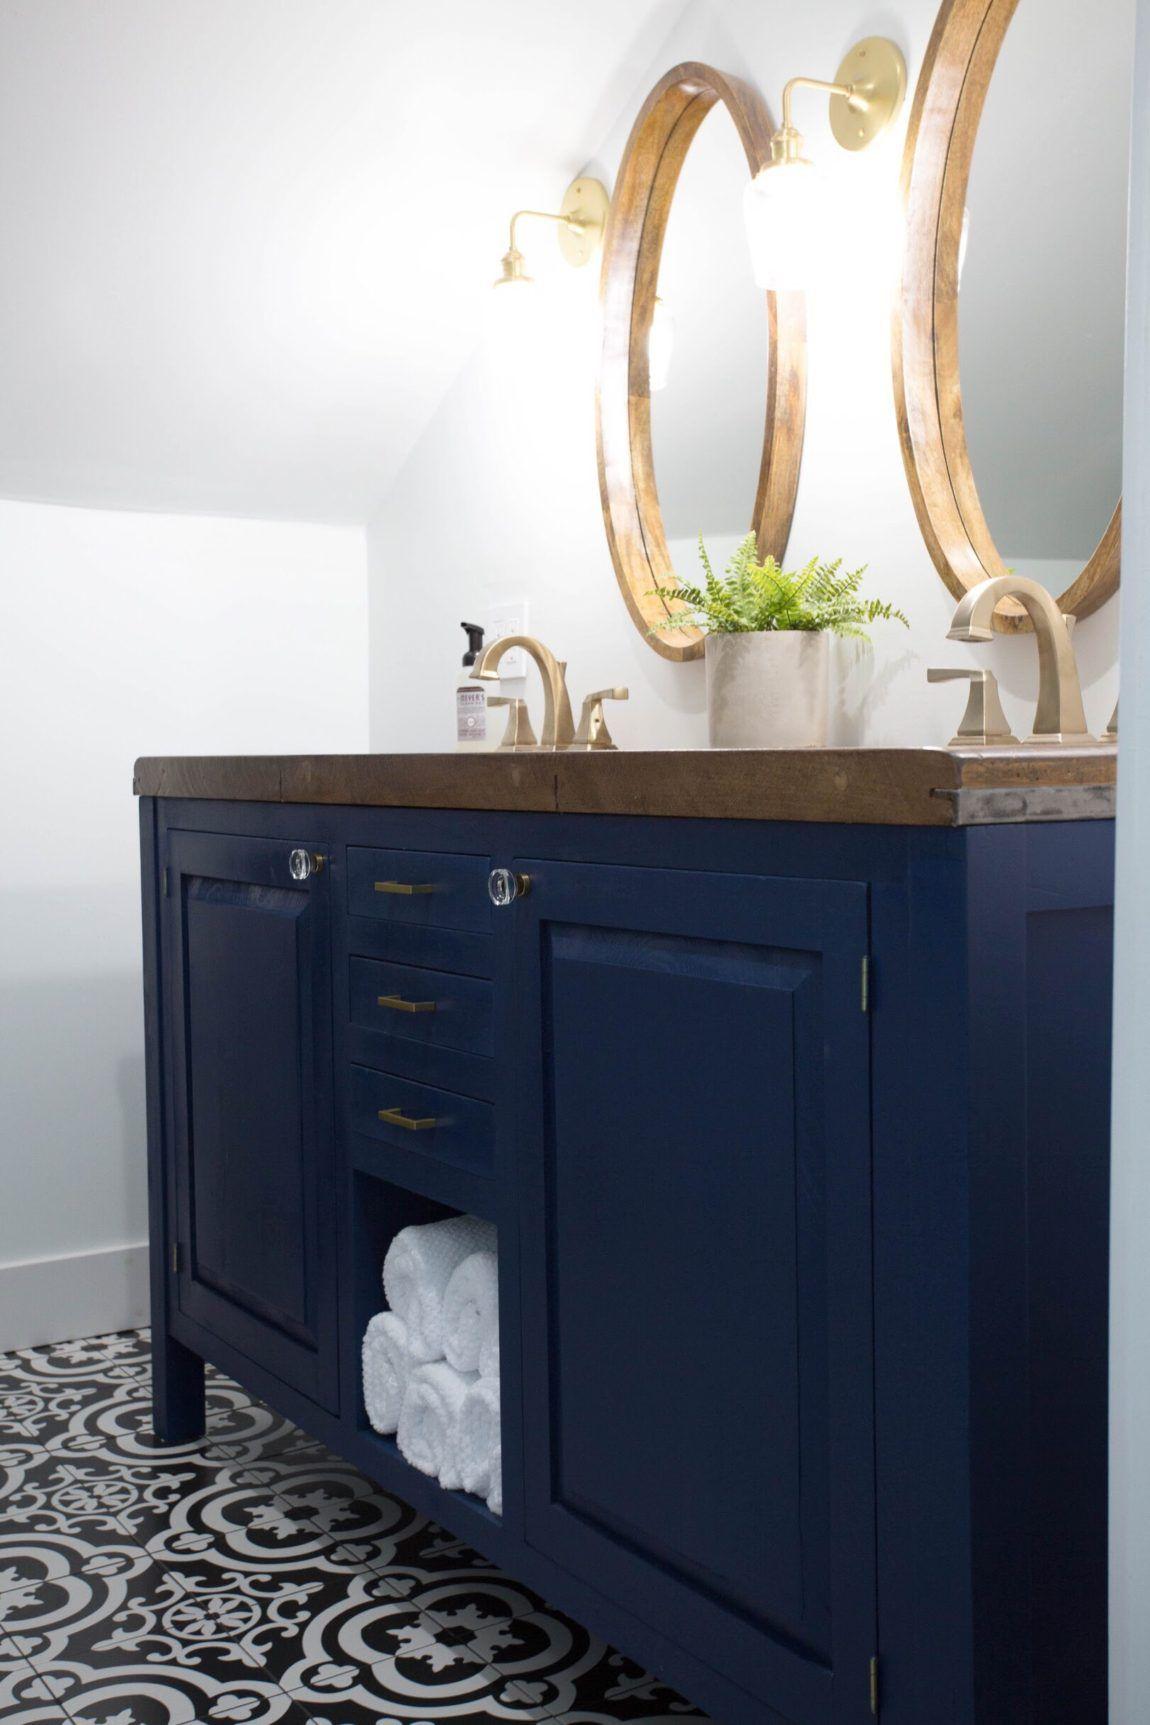 43+ Blue bathroom vanity ideas model